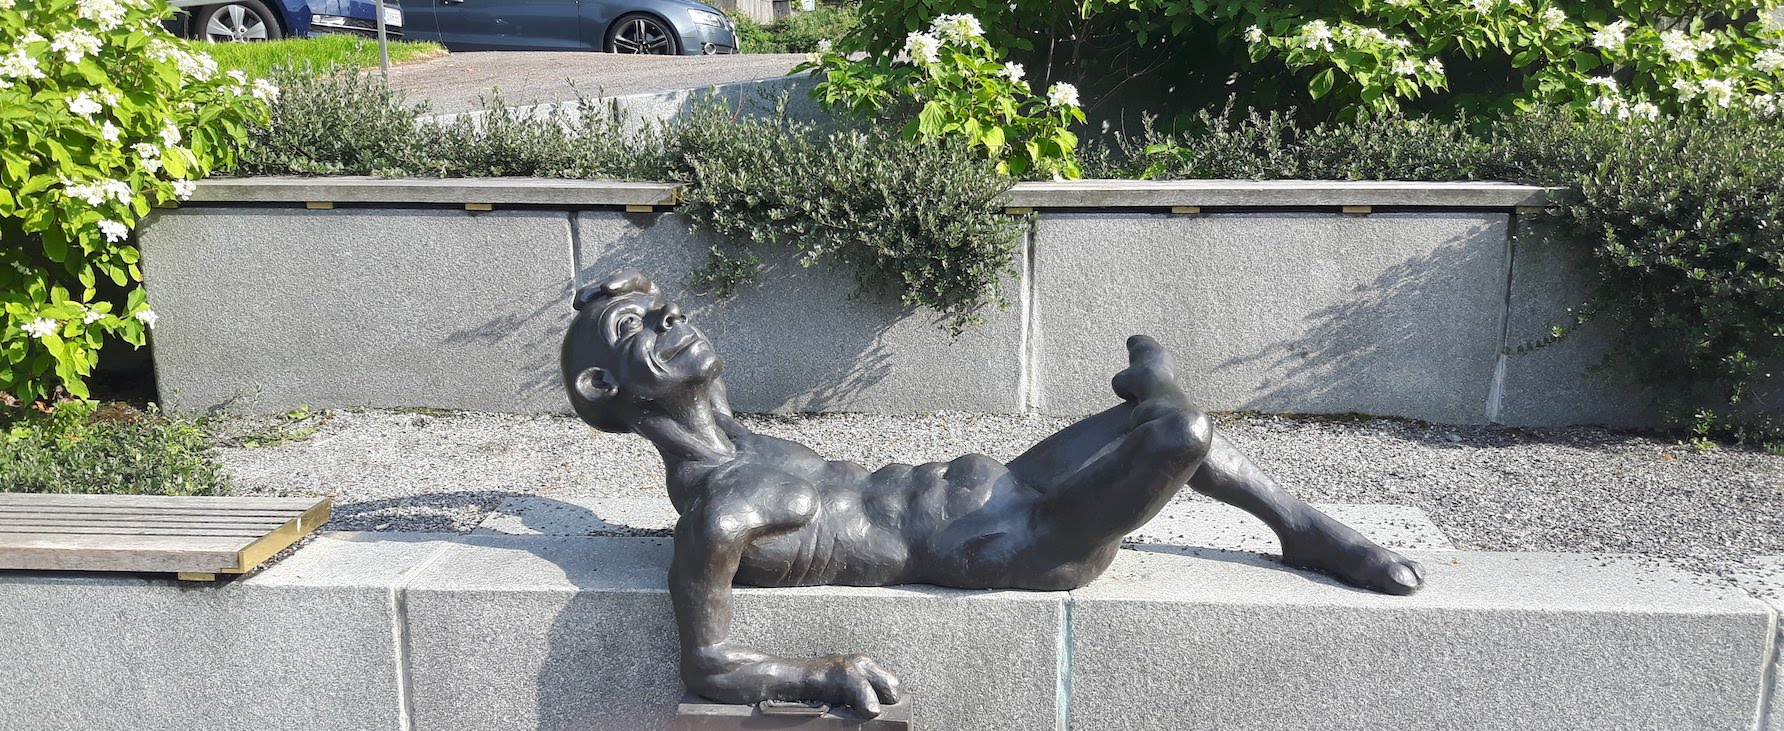 Statue Turku Finland